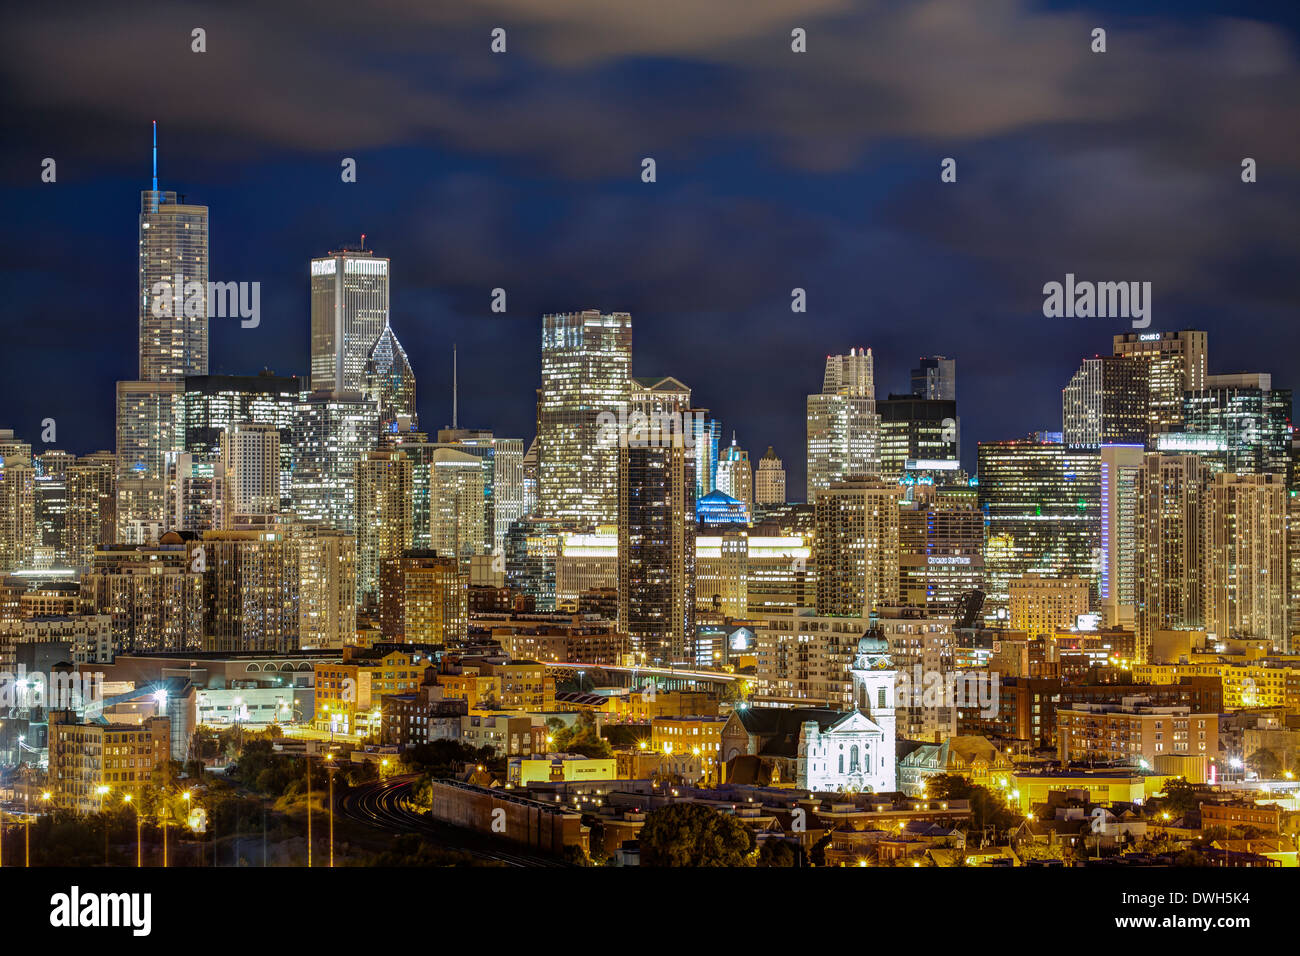 Chicago, Illinois, United States of America, City Skyline at night - Stock Image